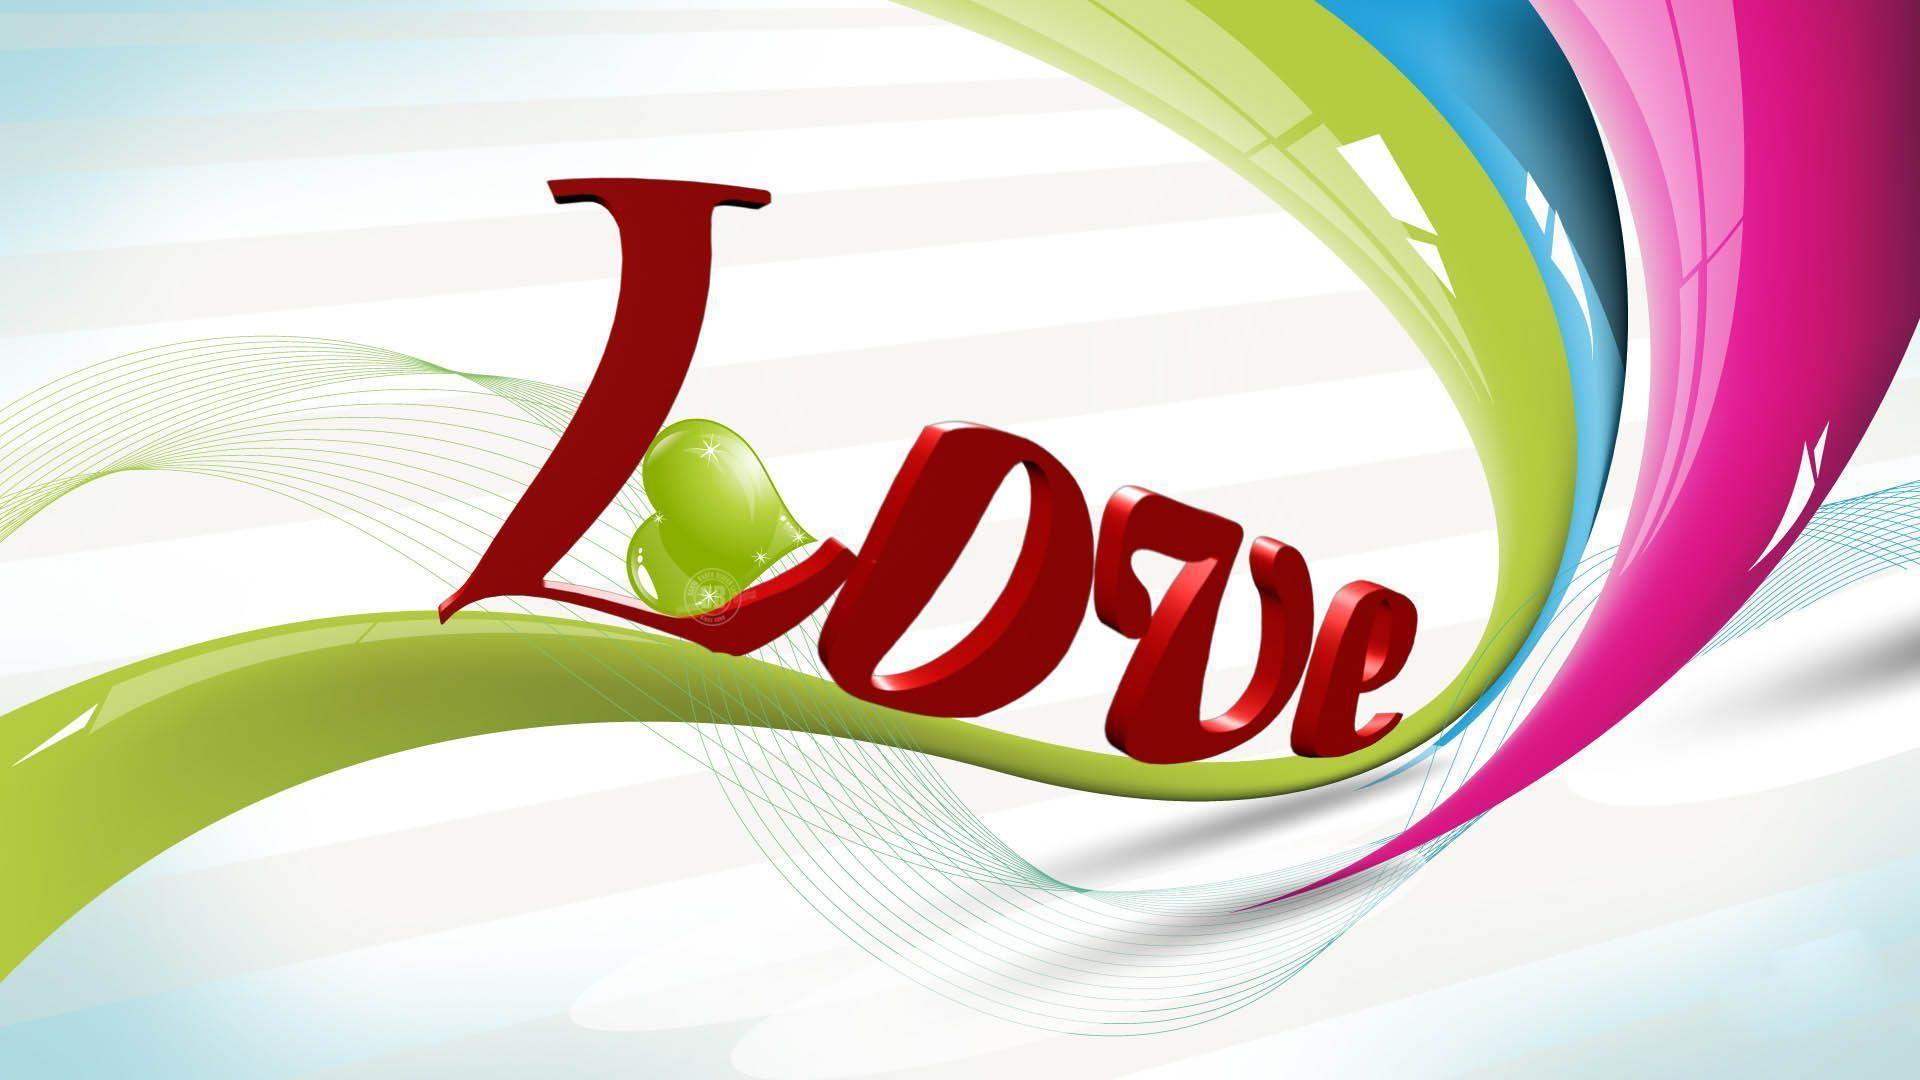 New love wallpapers wallpaper cave - Love wallpaper new ...